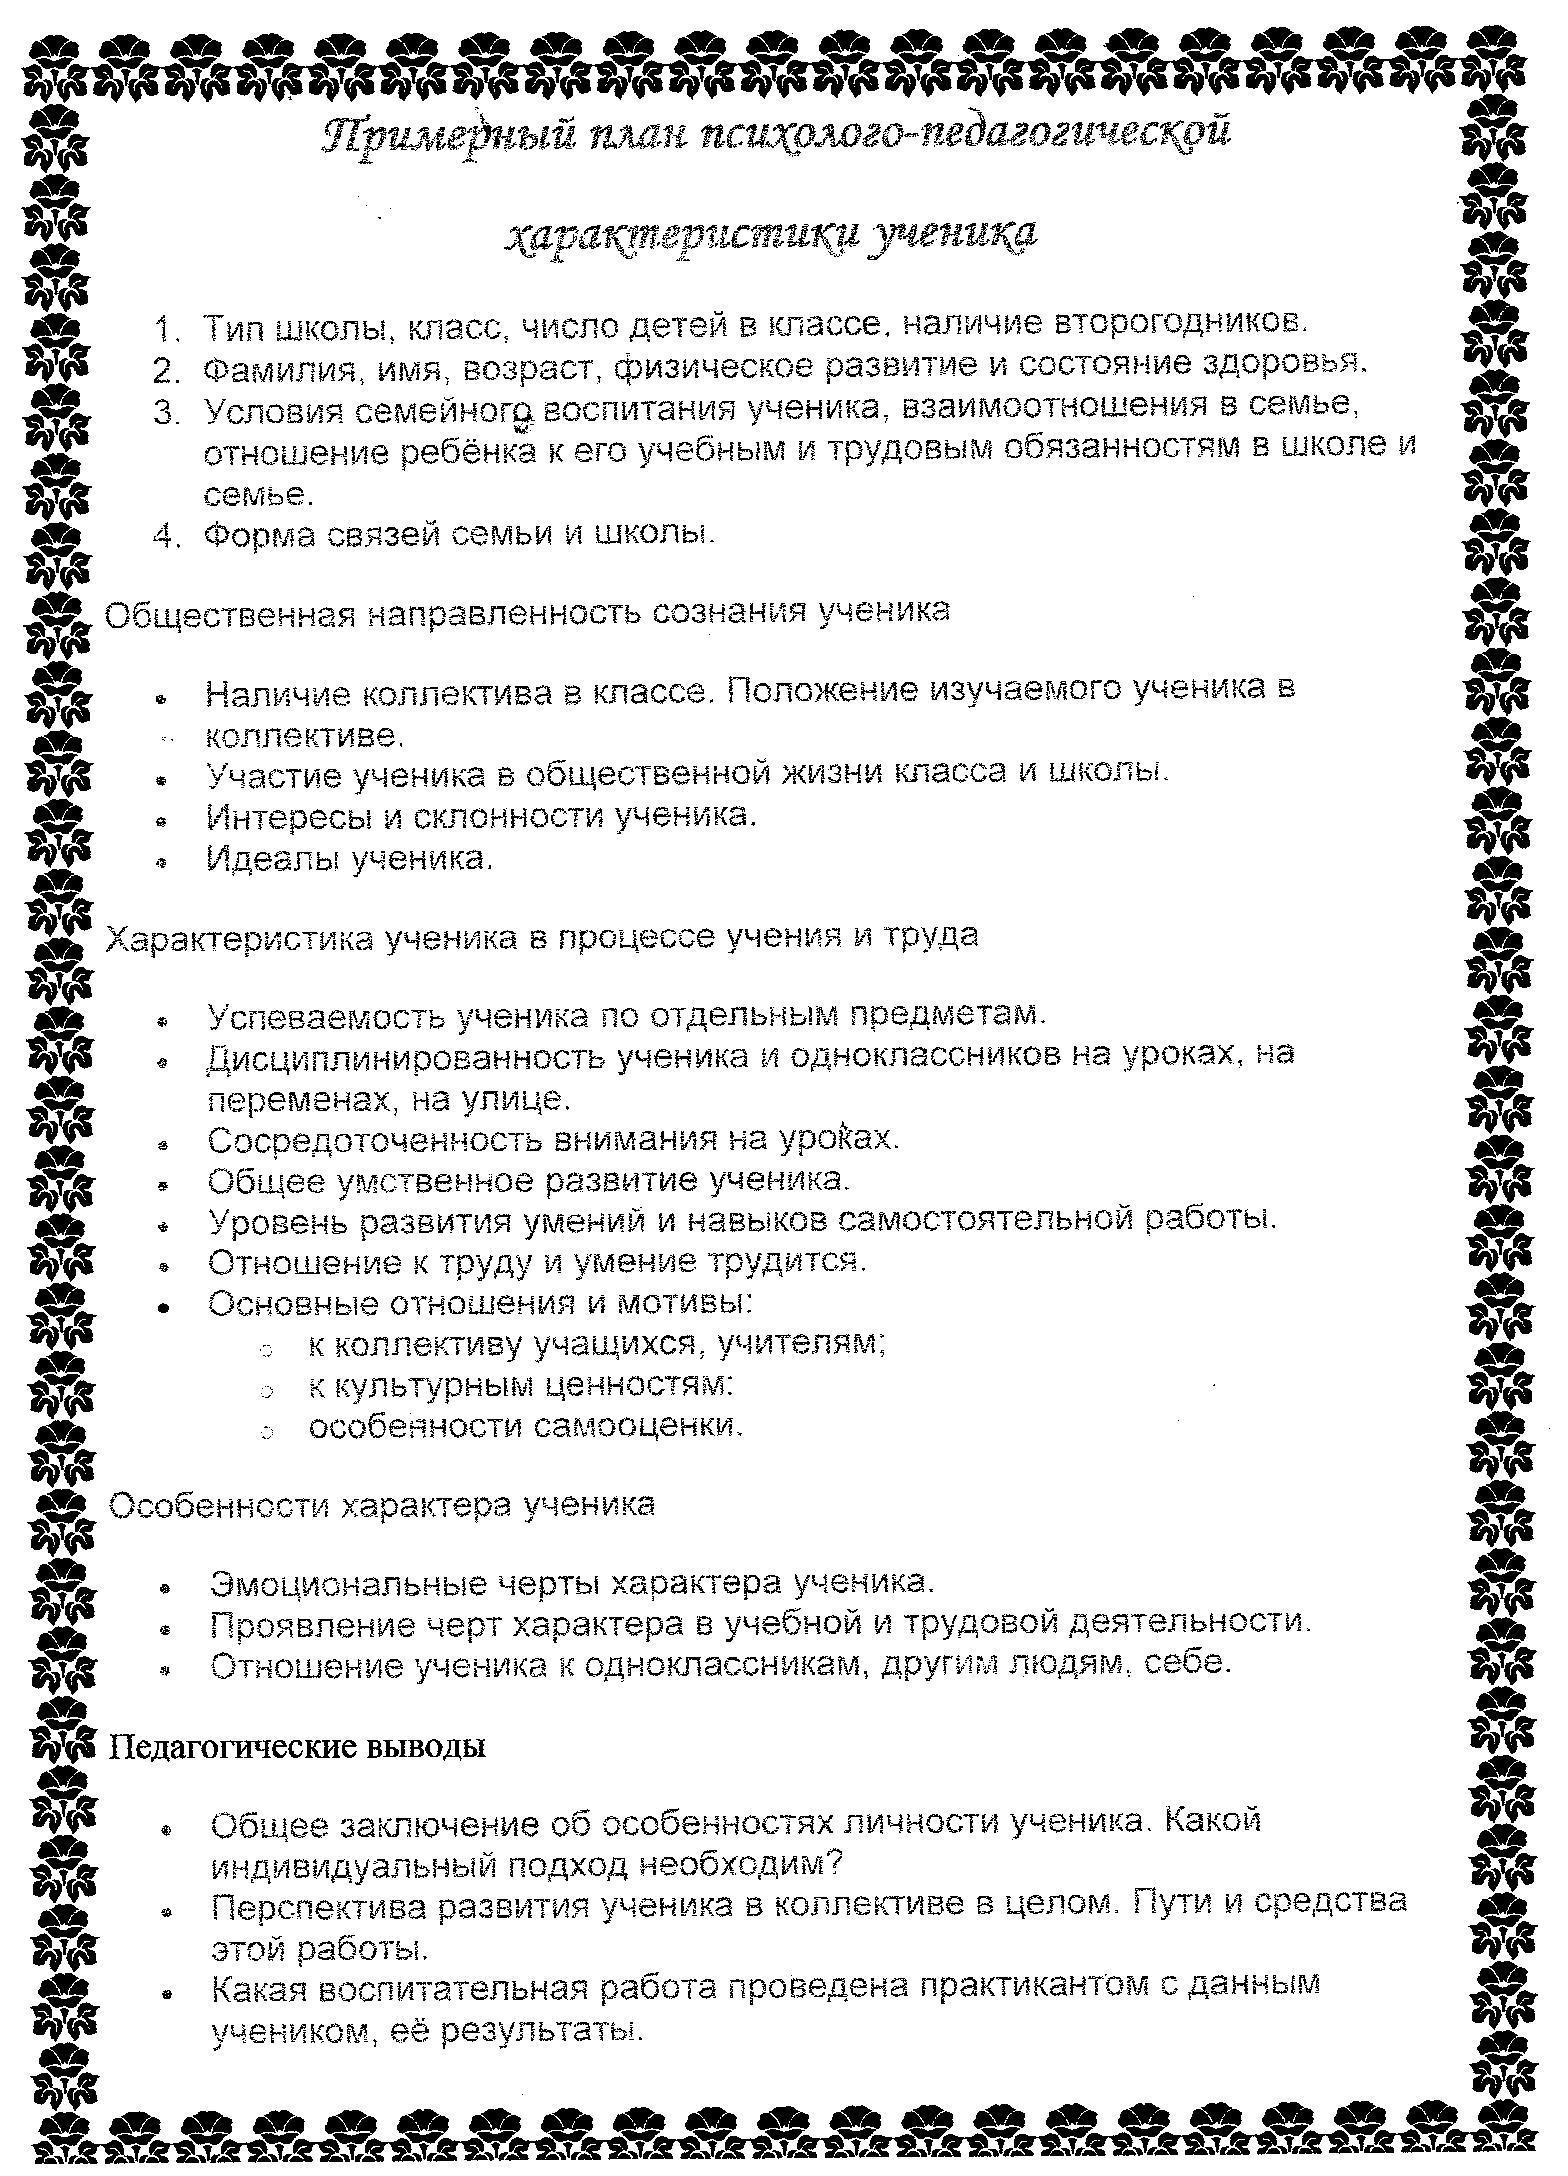 C:\Documents and Settings\Admin\Рабочий стол\Изображение5641631321 006.jpg